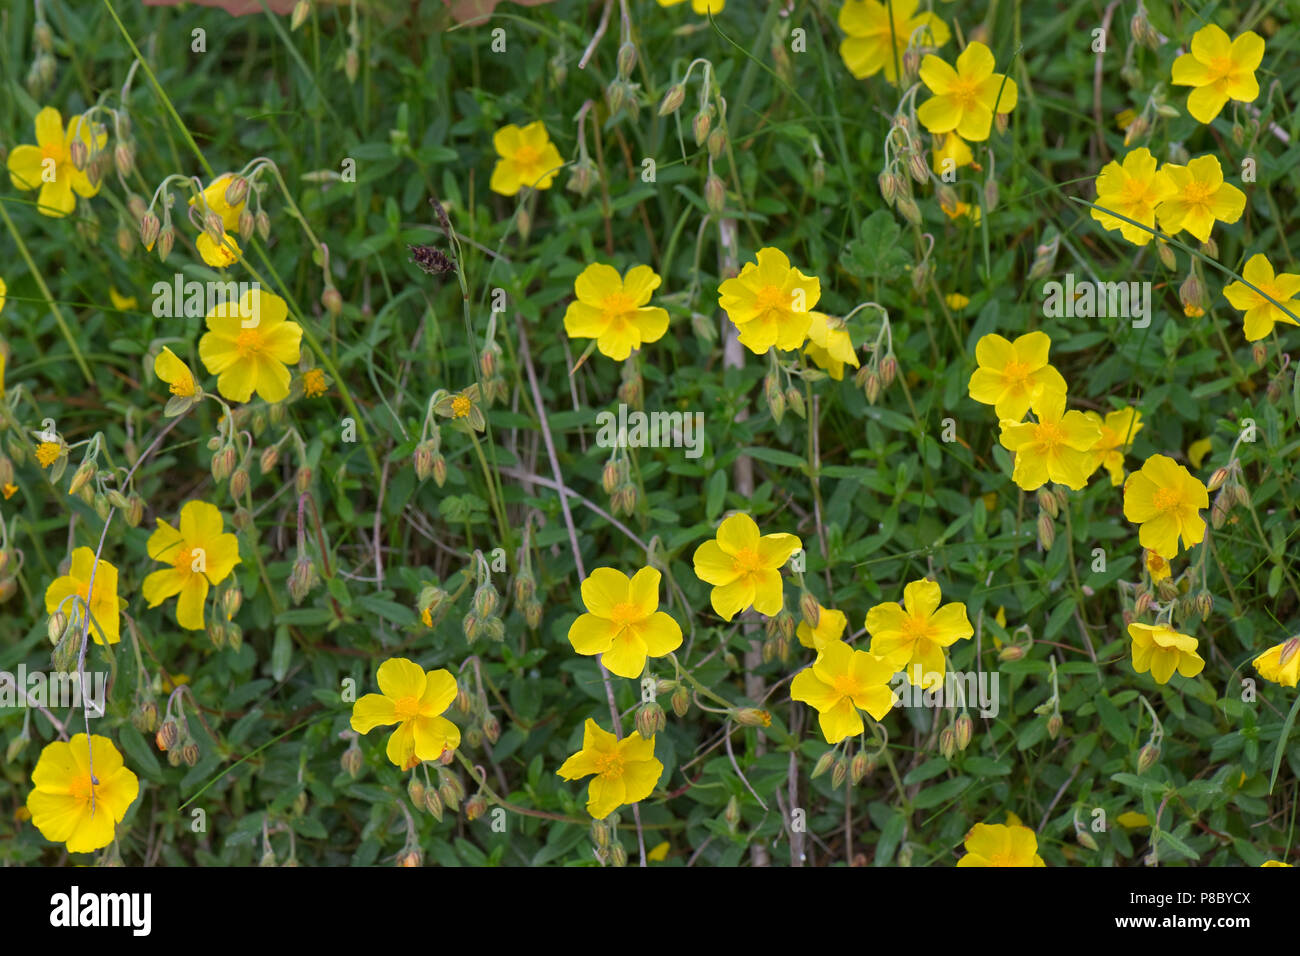 Common rock-rose, Helianthemum nummularium, yellow flowers flowering on chalk downland soil, June - Stock Image